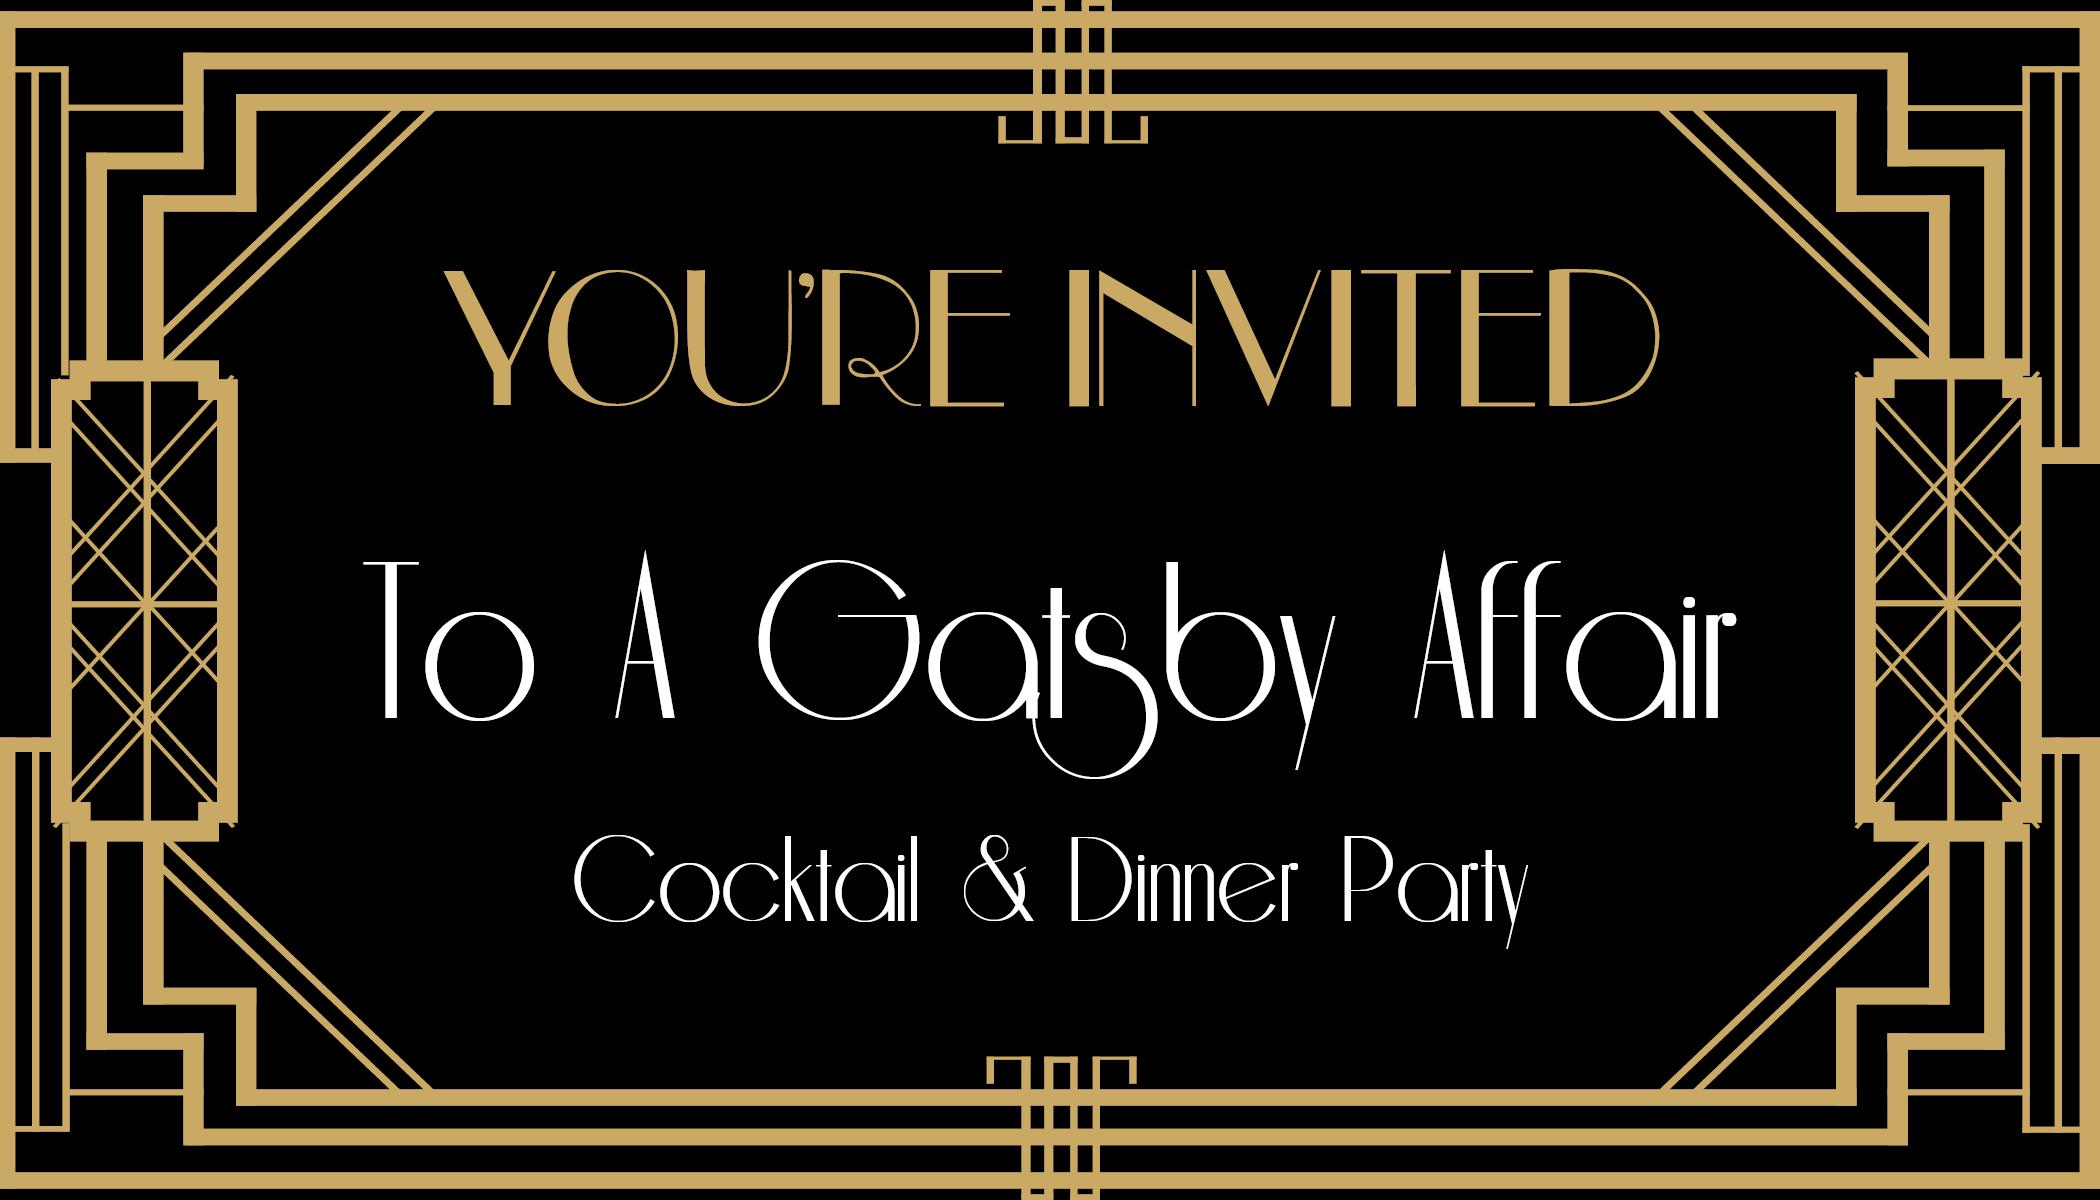 Gatsby_Affair_Invite.png